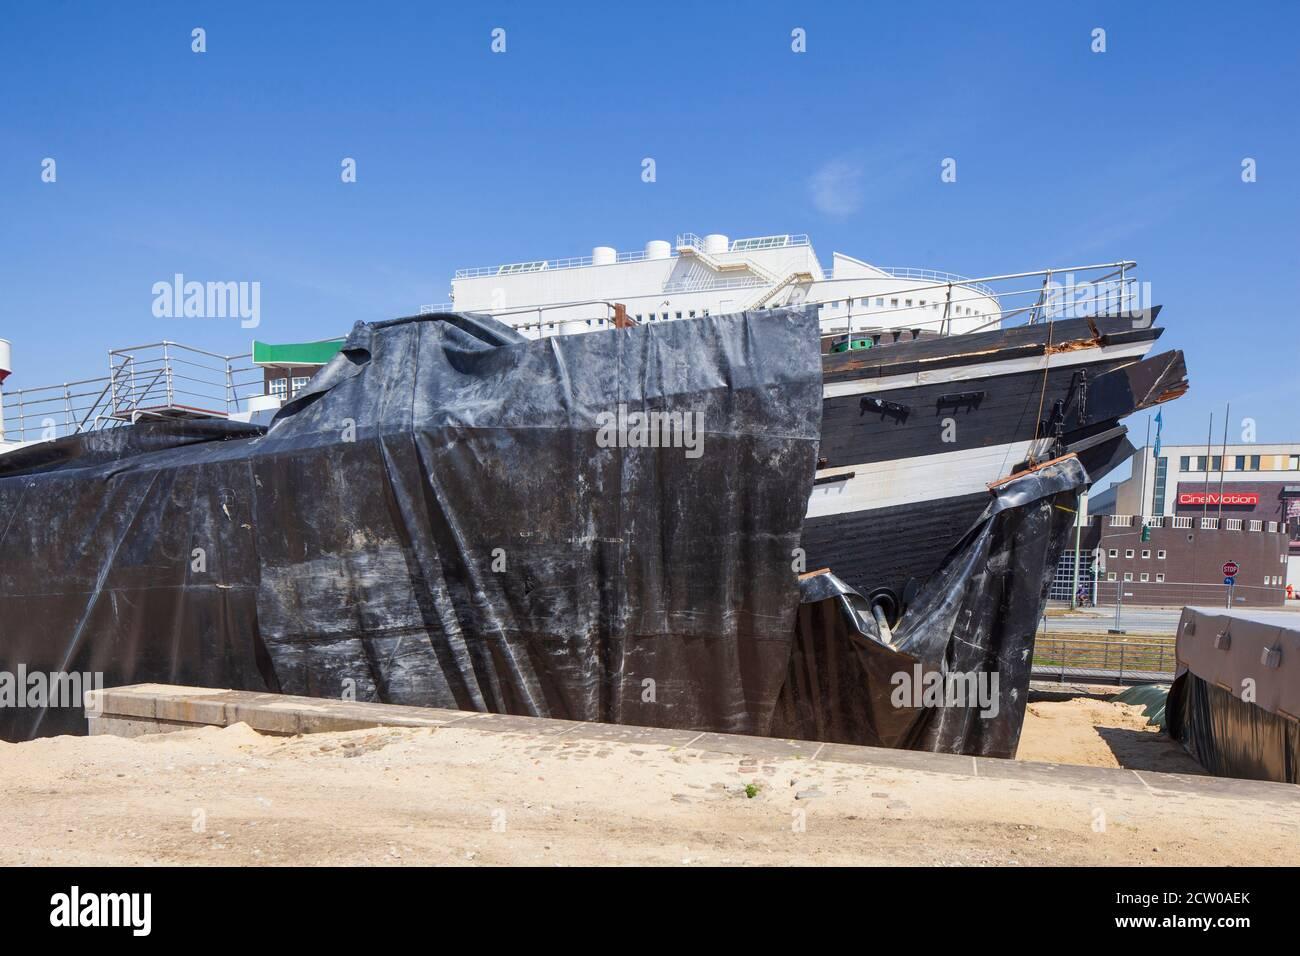 Wreck of the windjammer Seute Deern in the museum harbor, Bremerhaven, Bremen, Germany Stock Photo